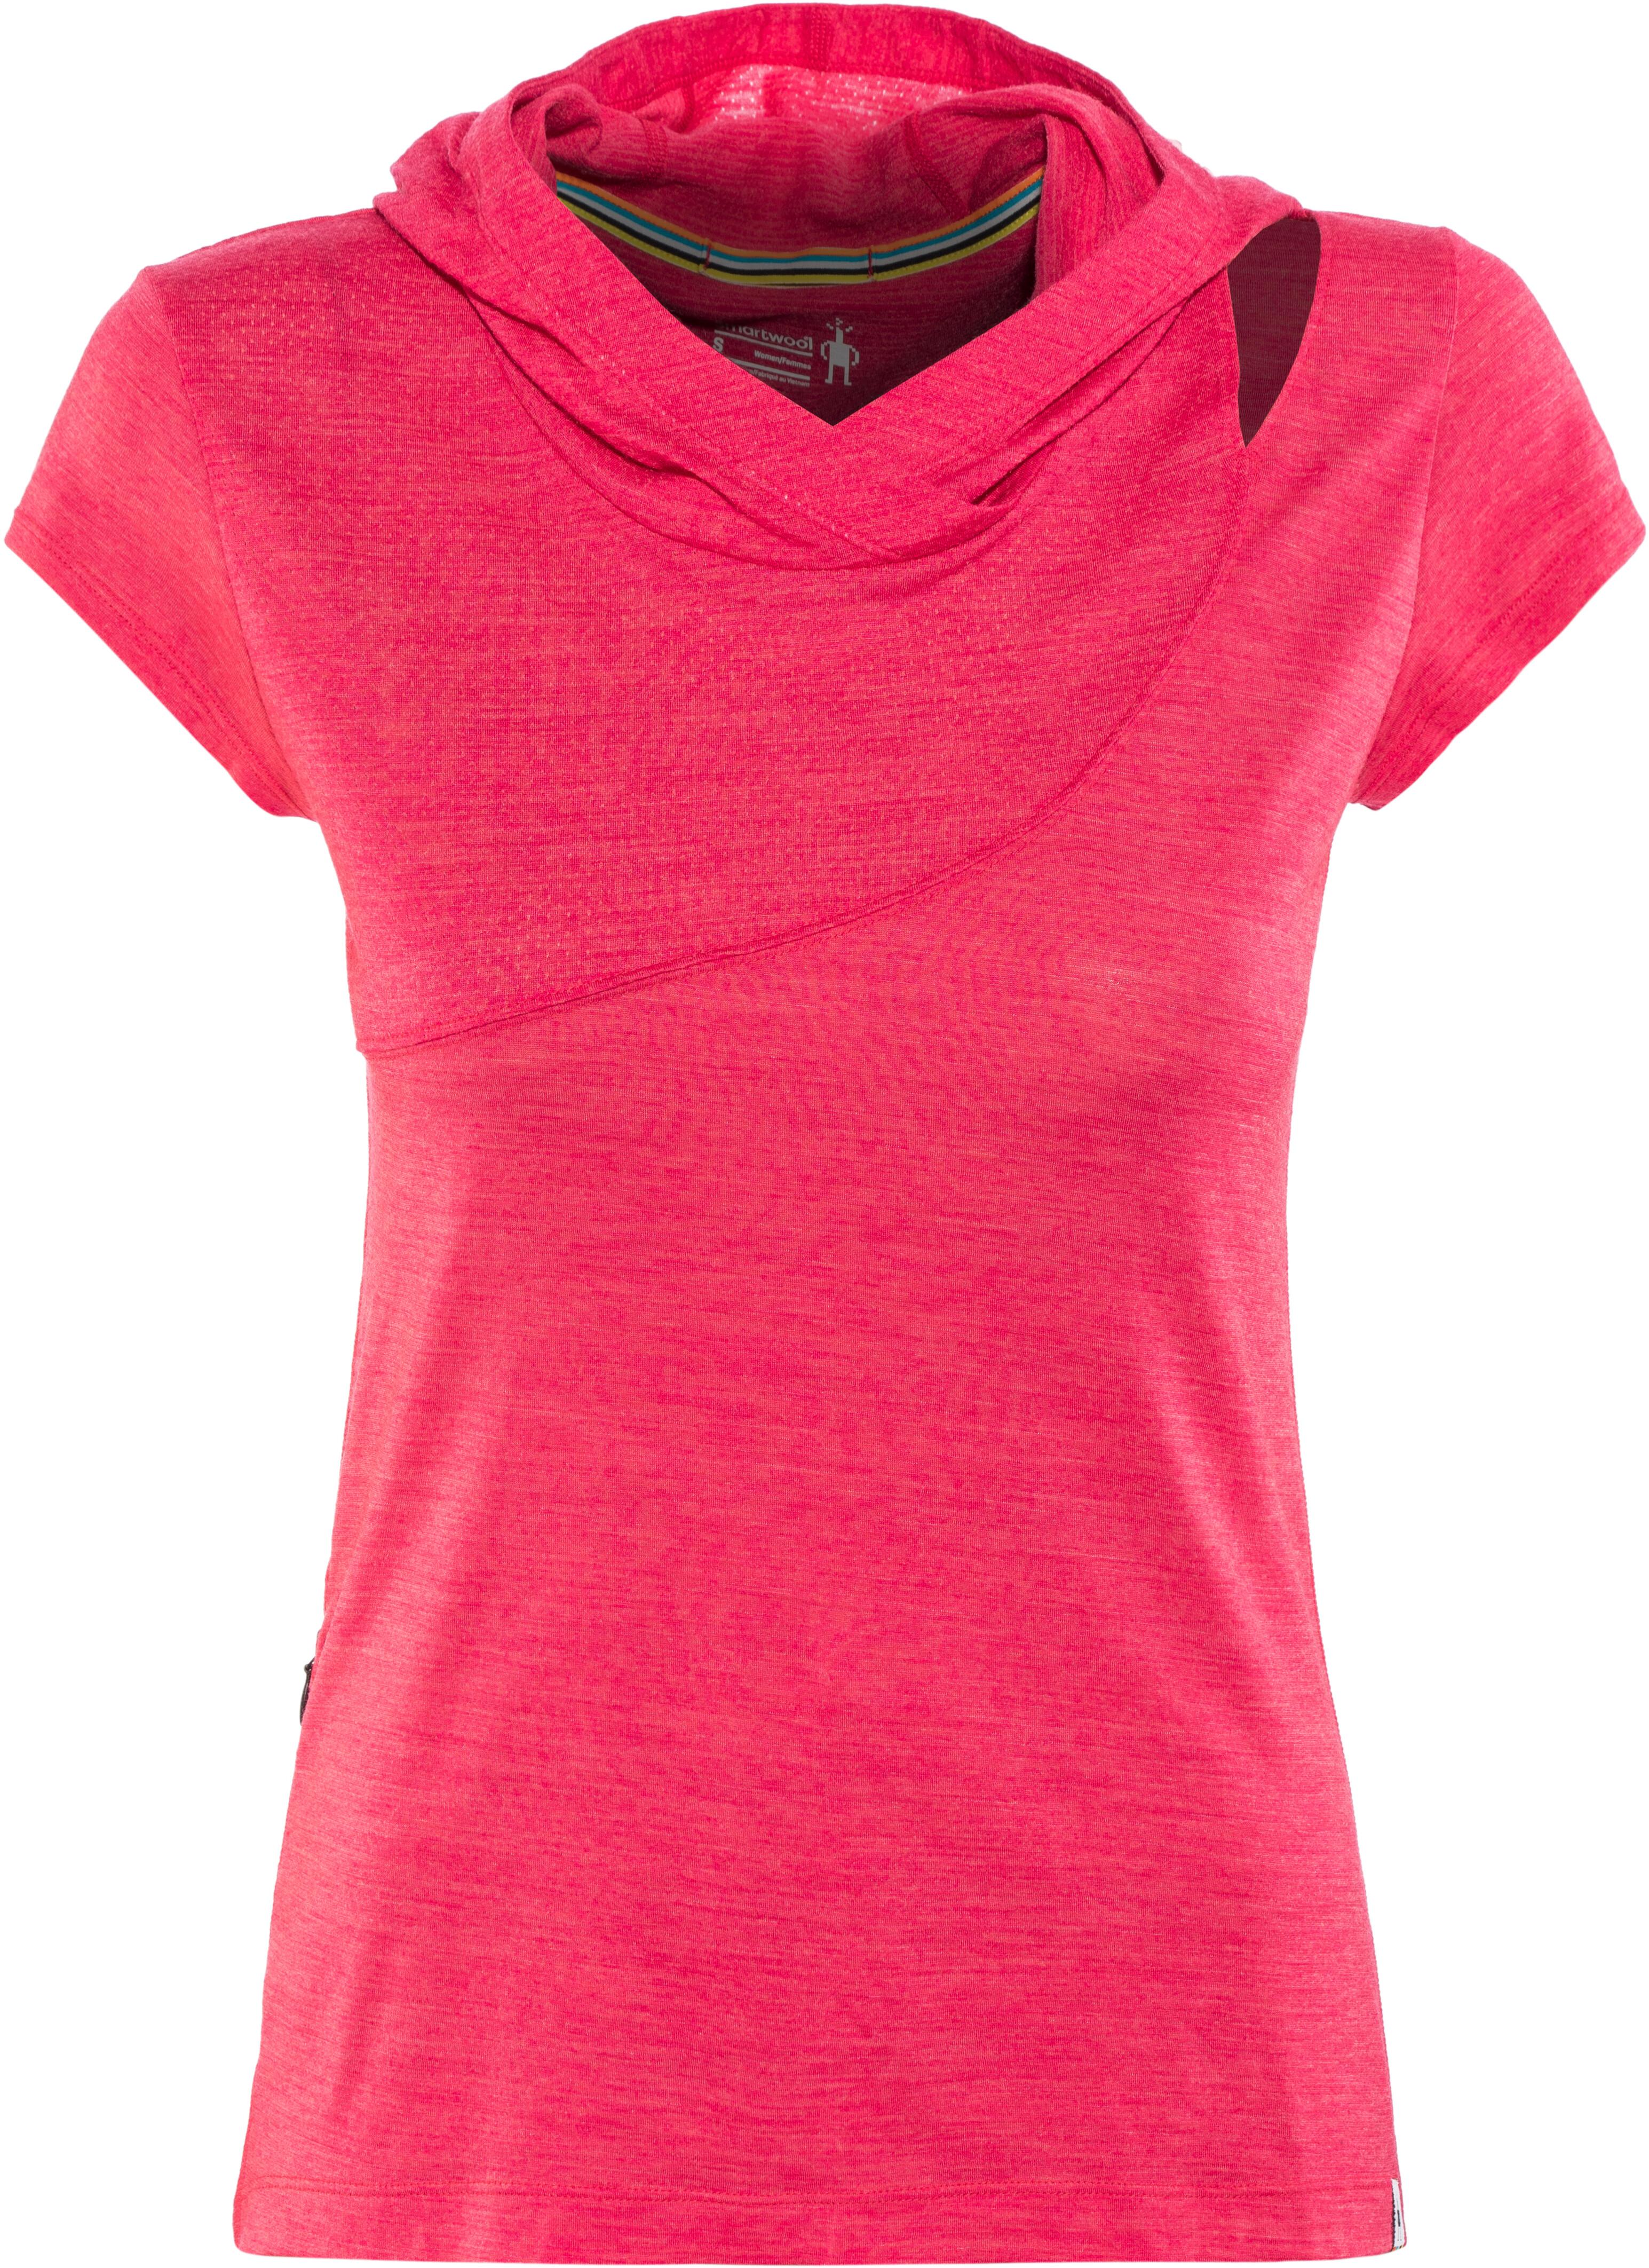 3ea9cc53 Smartwool Everyday Exploration Shortsleeve Shirt Women pink at ...